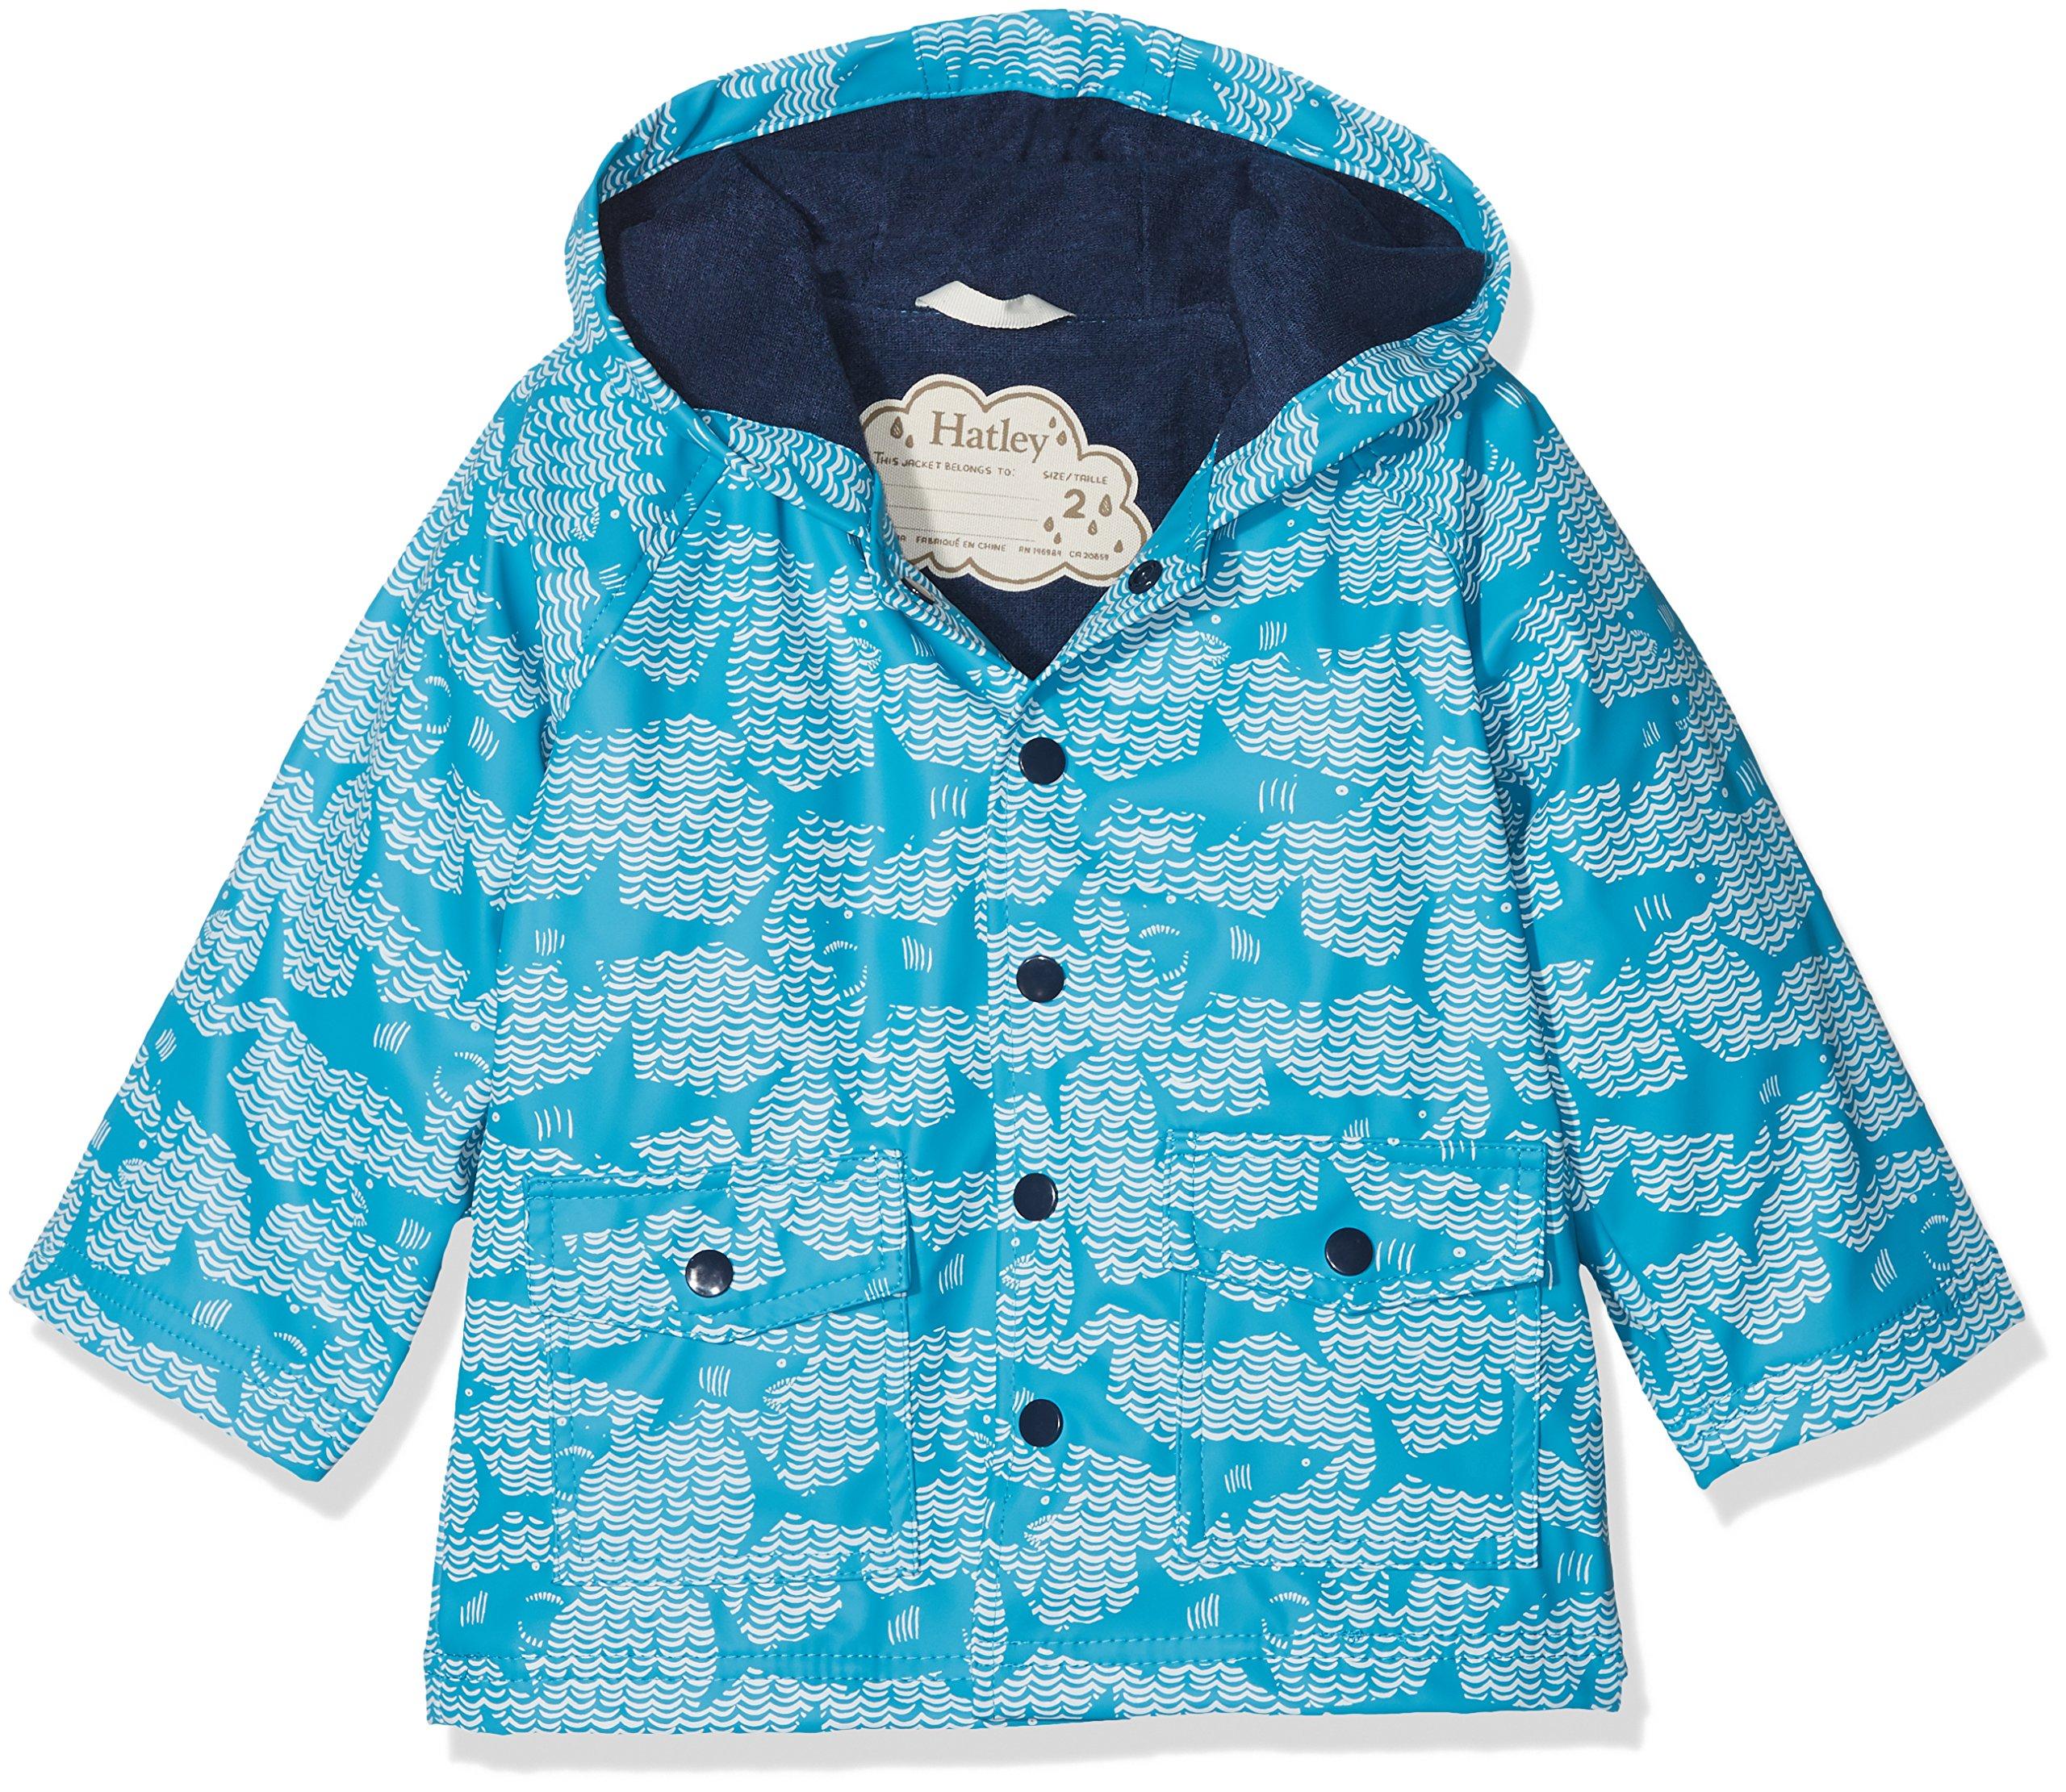 Hatley Kids Baby Boy's Shark Alley Classic Raincoat (Toddler/Little Kids/Big Kids) Blue 6